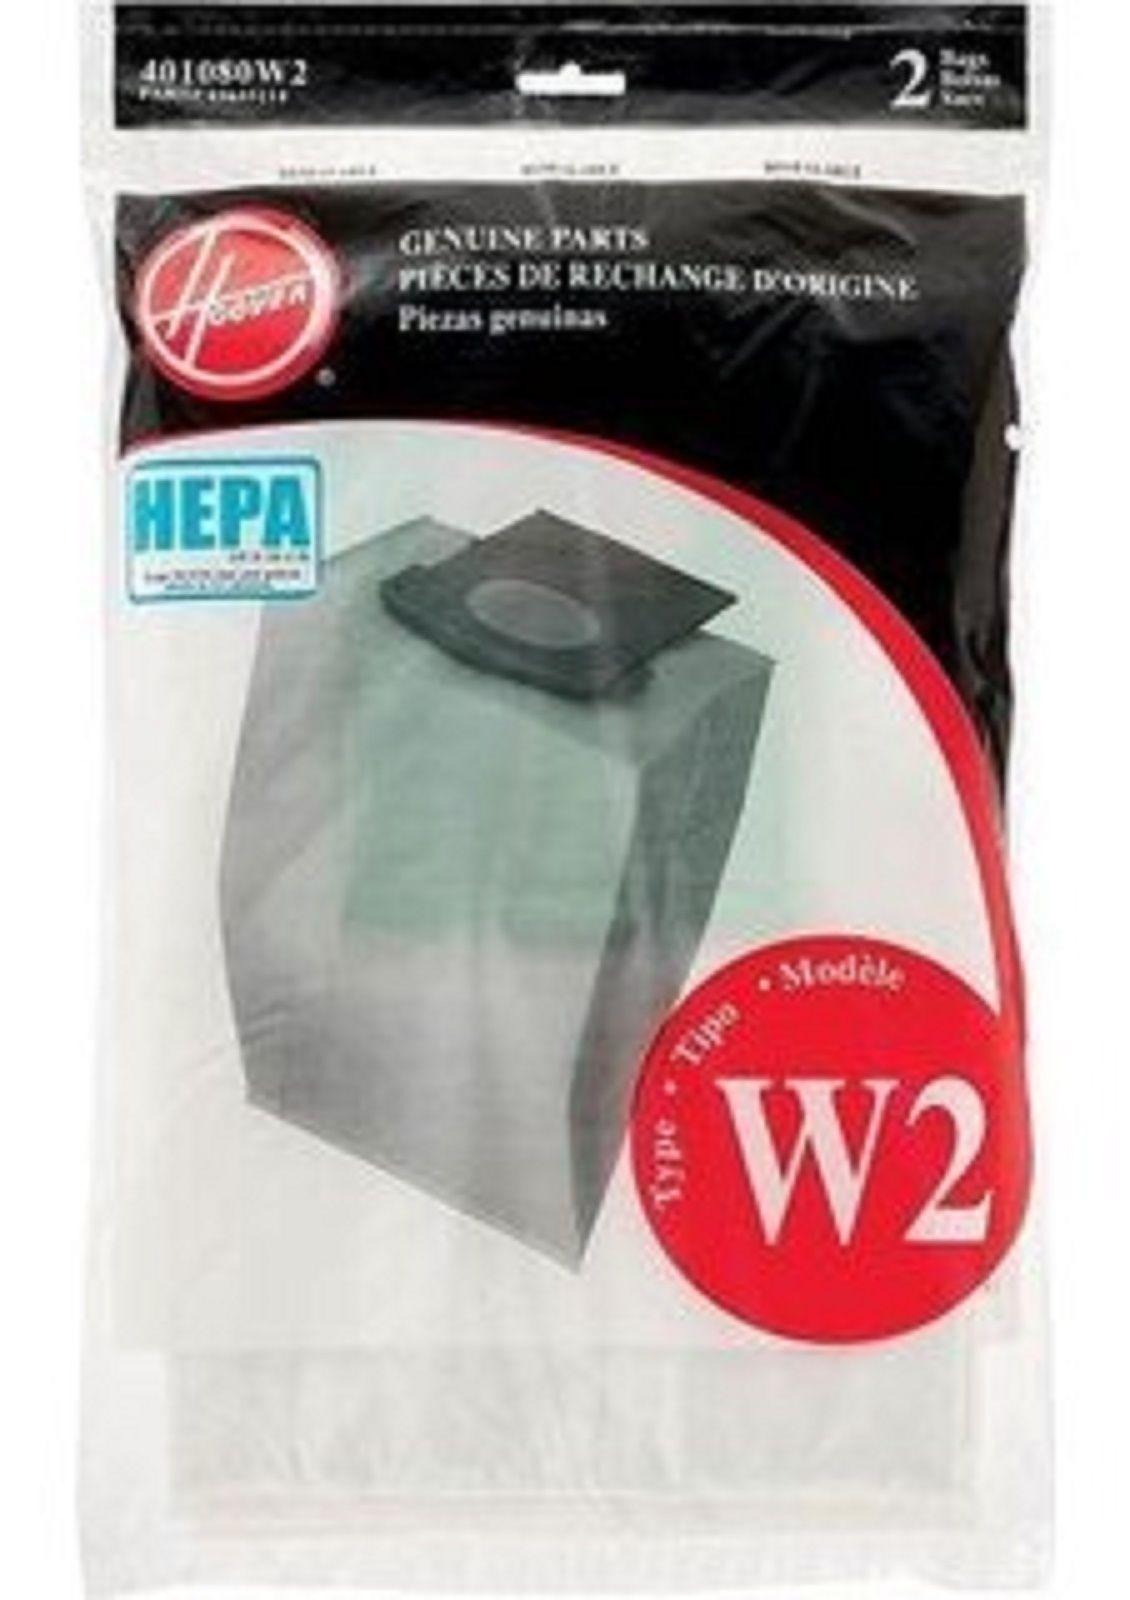 13 95 Hoover Windtunnel 2 Upright Type W2 Hepa Bags 2 Pk Part 401080w2 43655114 Ebay Home Garden Hepa Hoover Windtunnel Bags